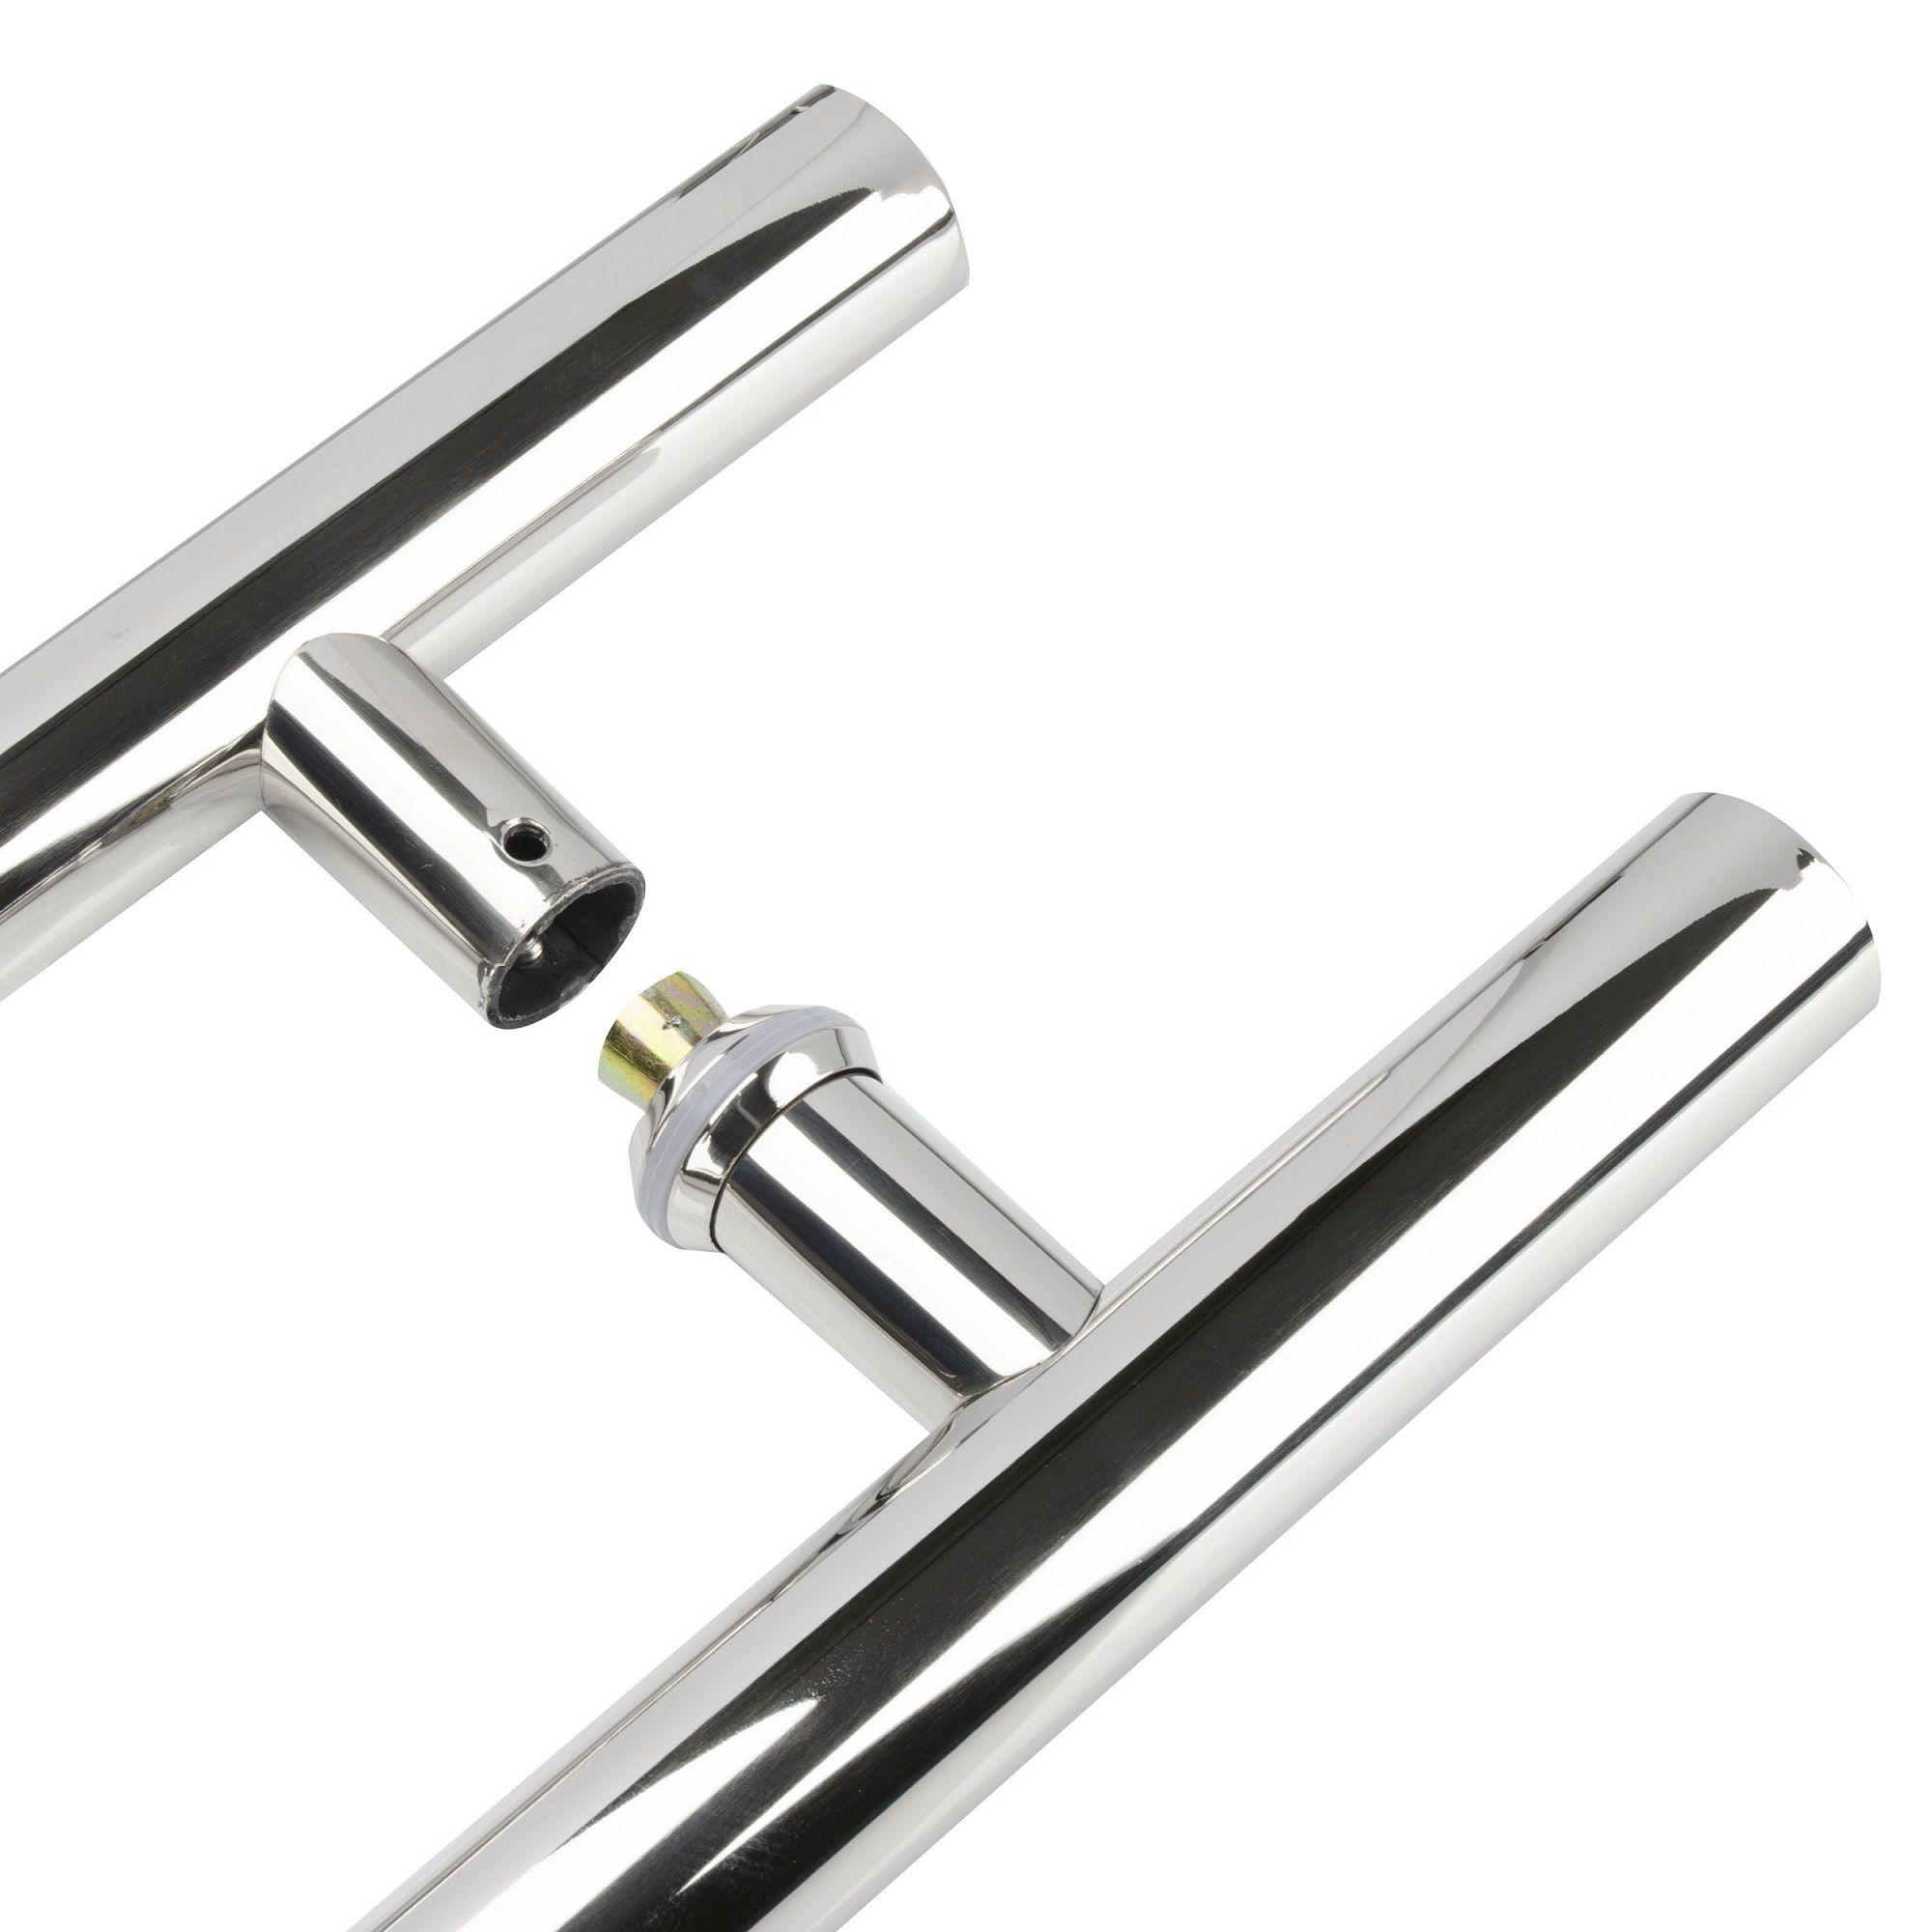 Kit P/ Porta Pivotante, Puxador Tubular 60cm + Fechadura Rolete